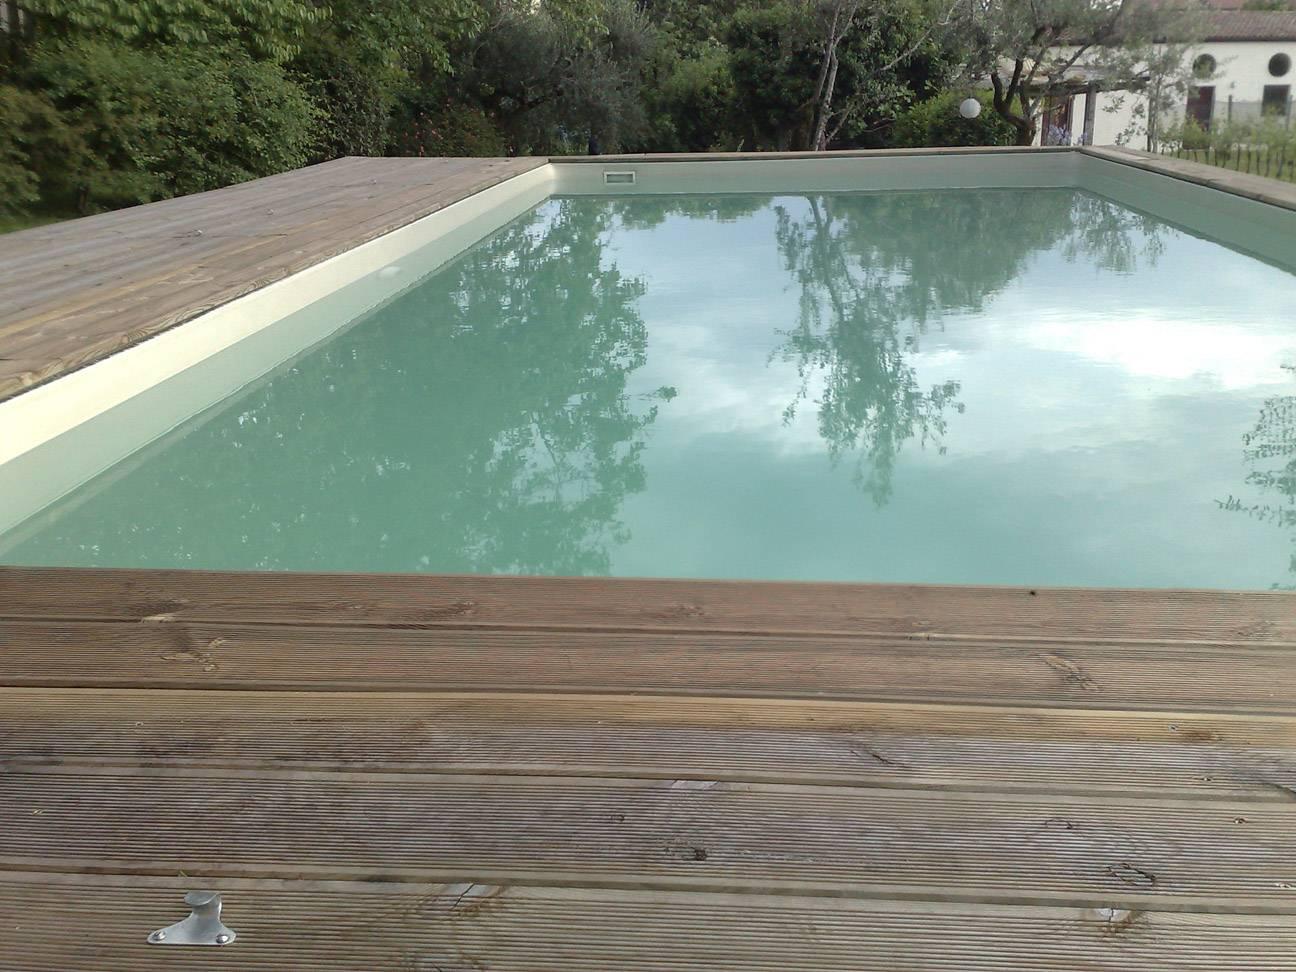 Le piscine fuori terra solaris - Piscina fuori terra ...